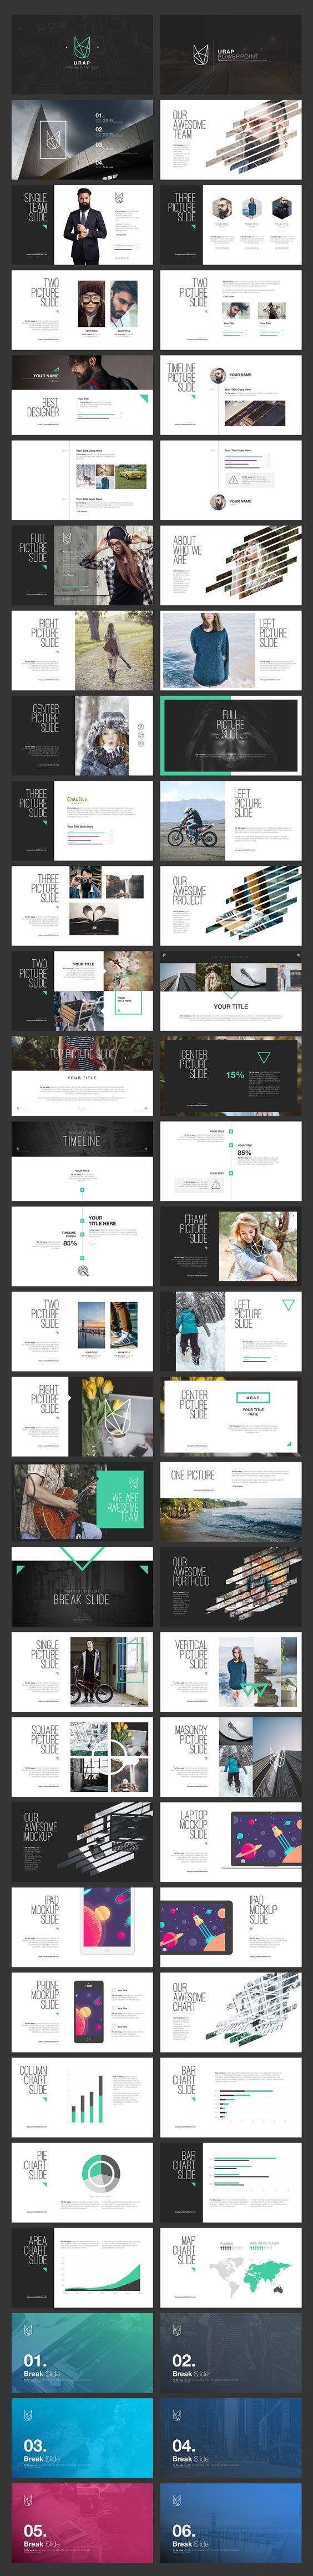 Double Spread | Set 5 | 09 | Work Examples | Pinterest ...